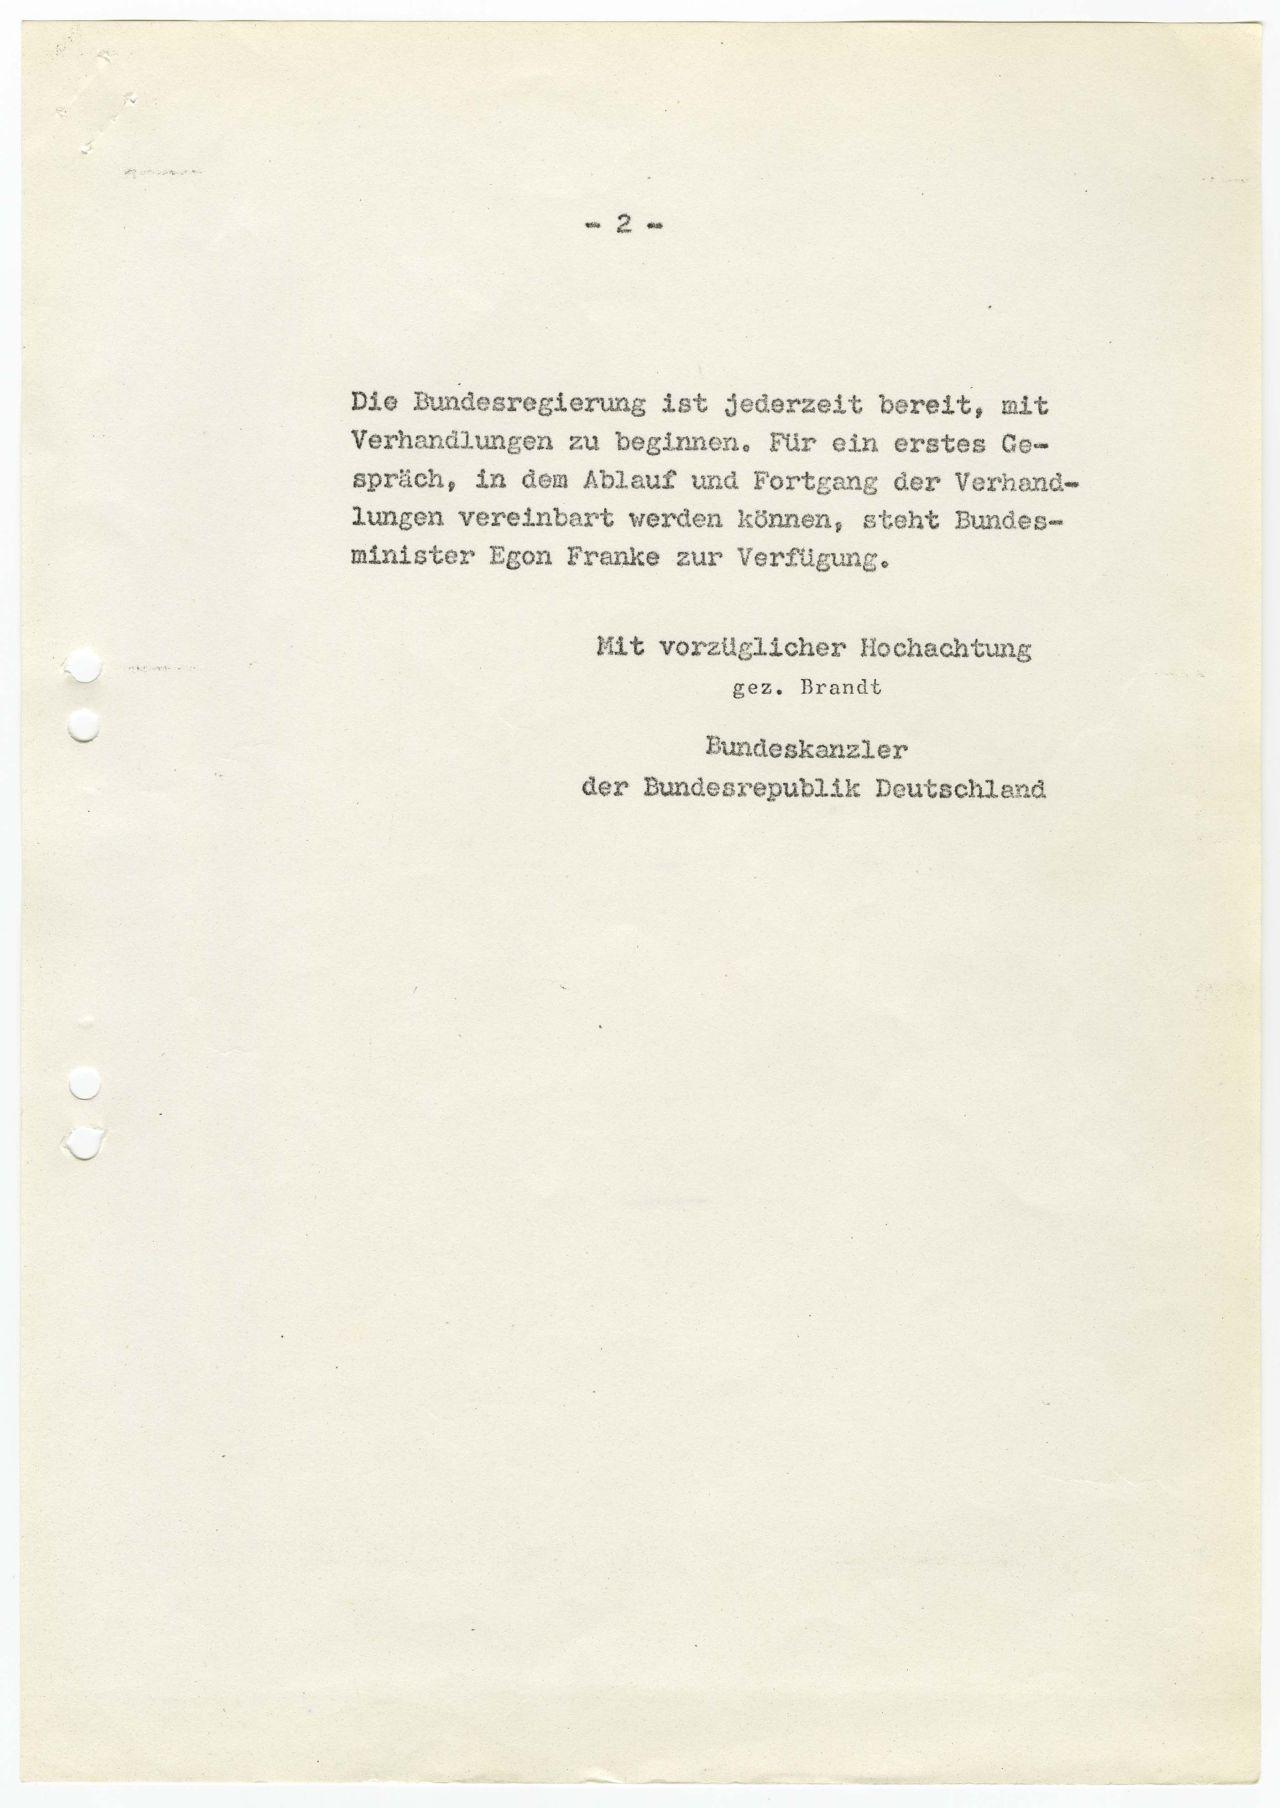 lemo-objekt: dokument einladung an stoph, Einladung